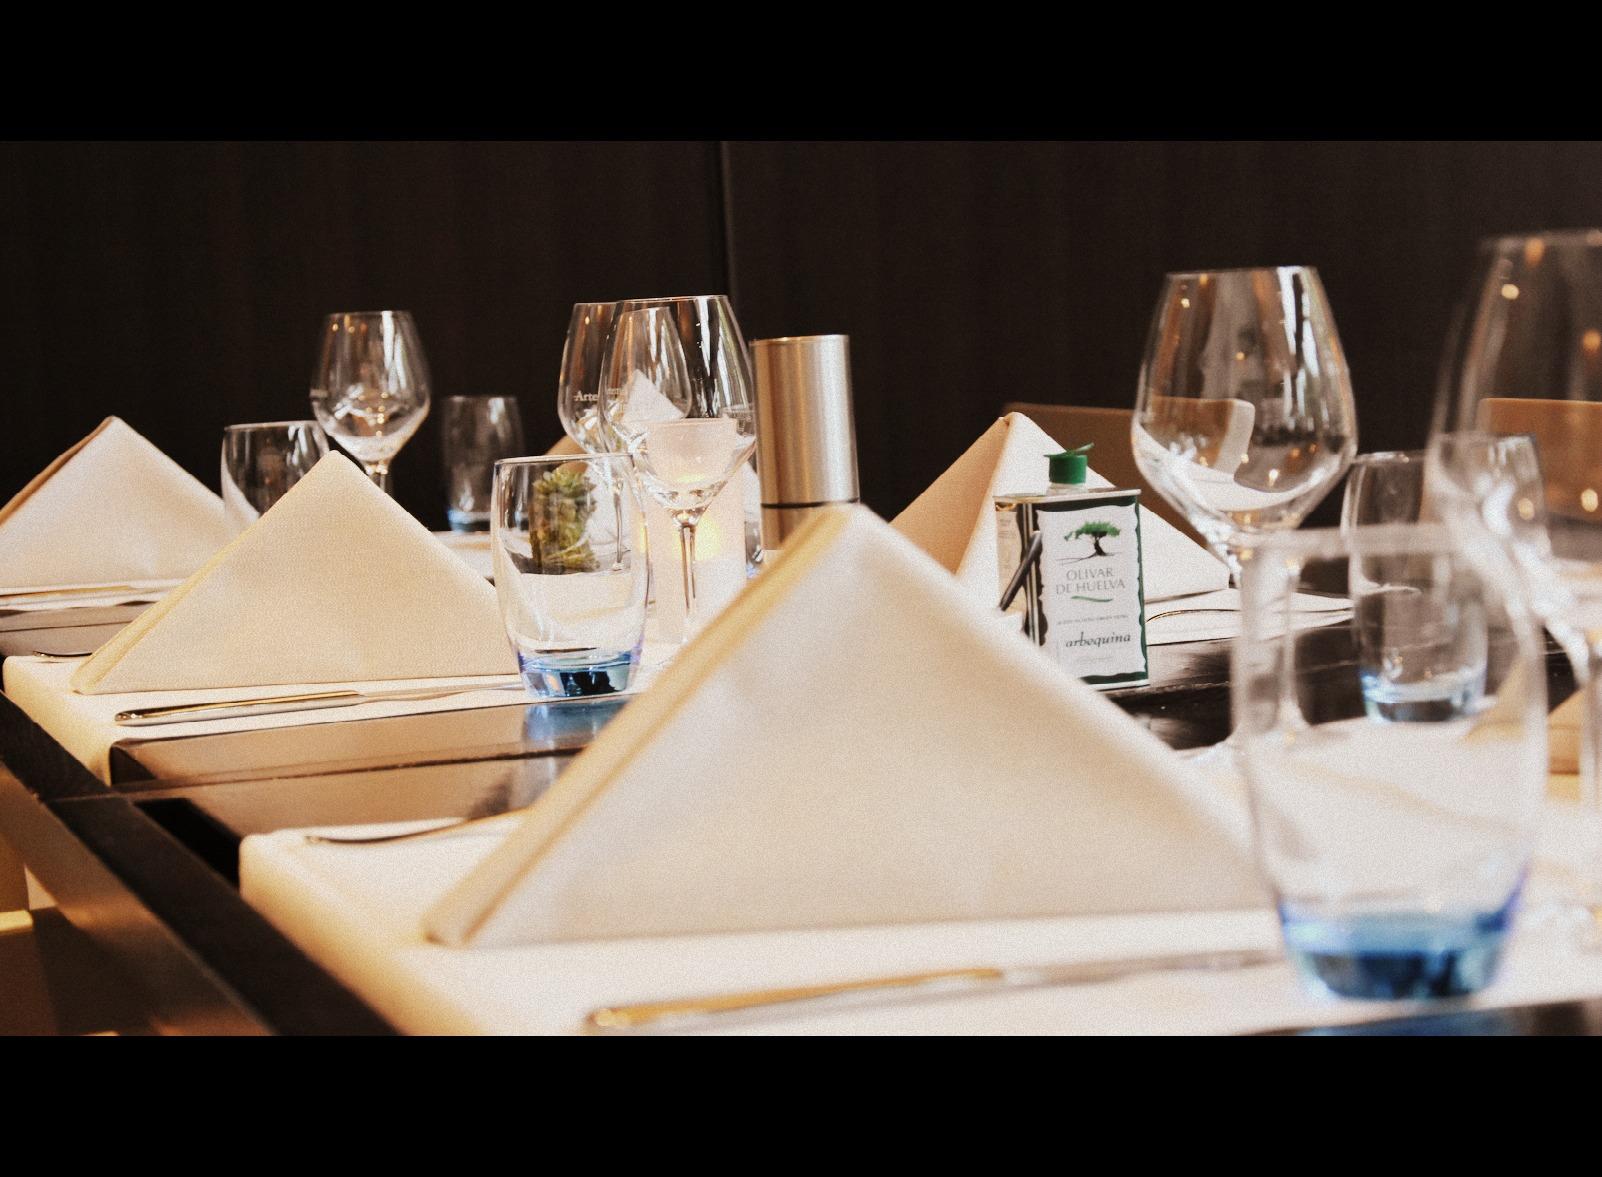 diner Dutch design hotel artiness, high tea vriendinnen